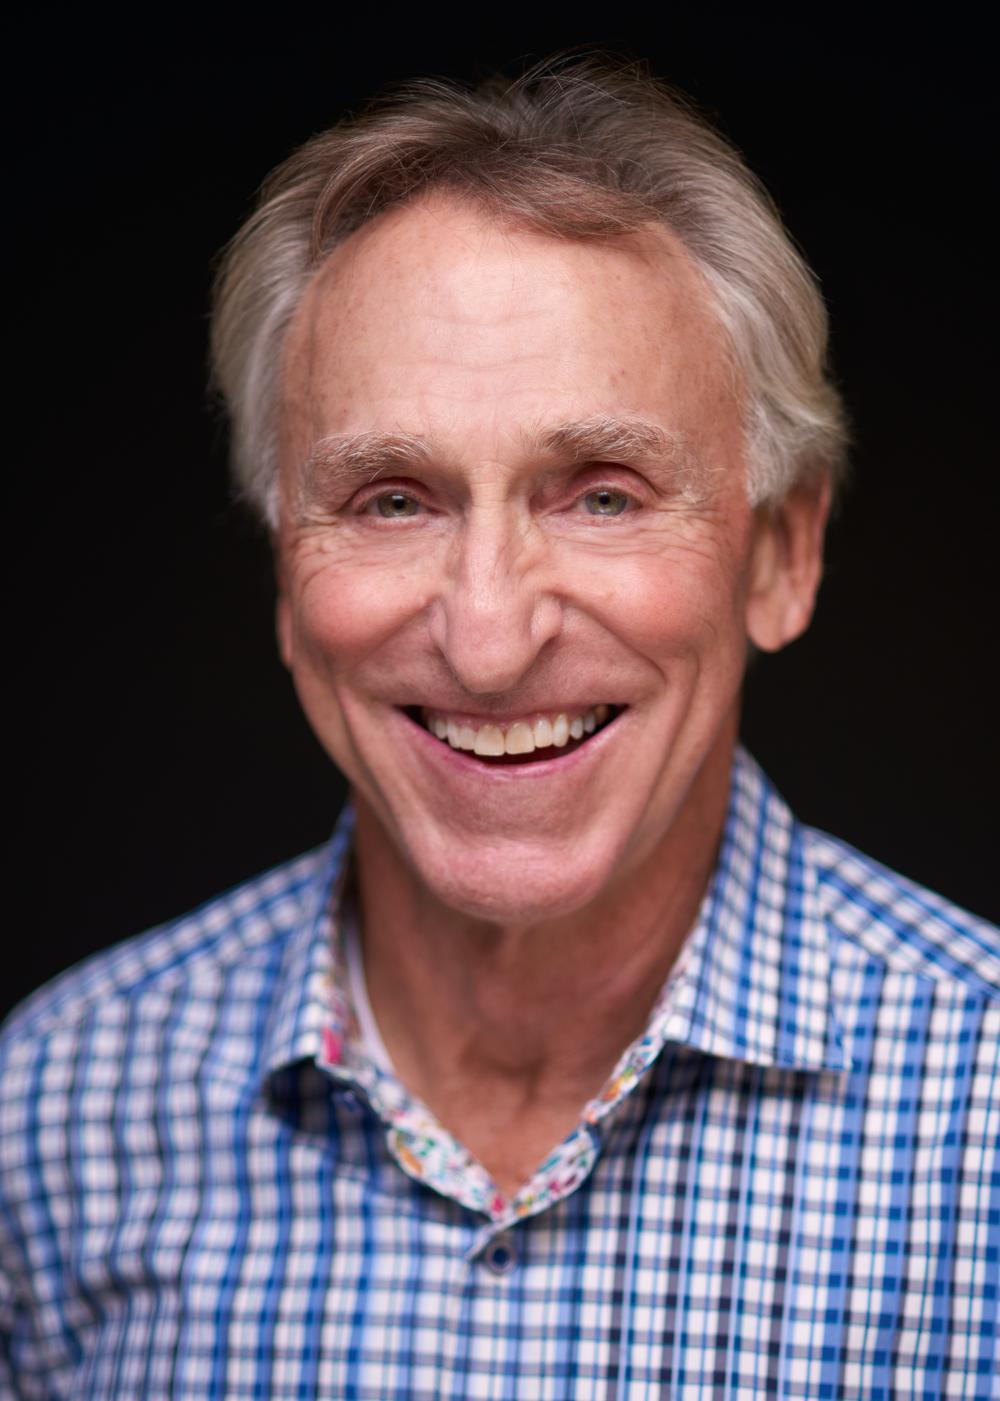 Gary Hall, CPA Photo